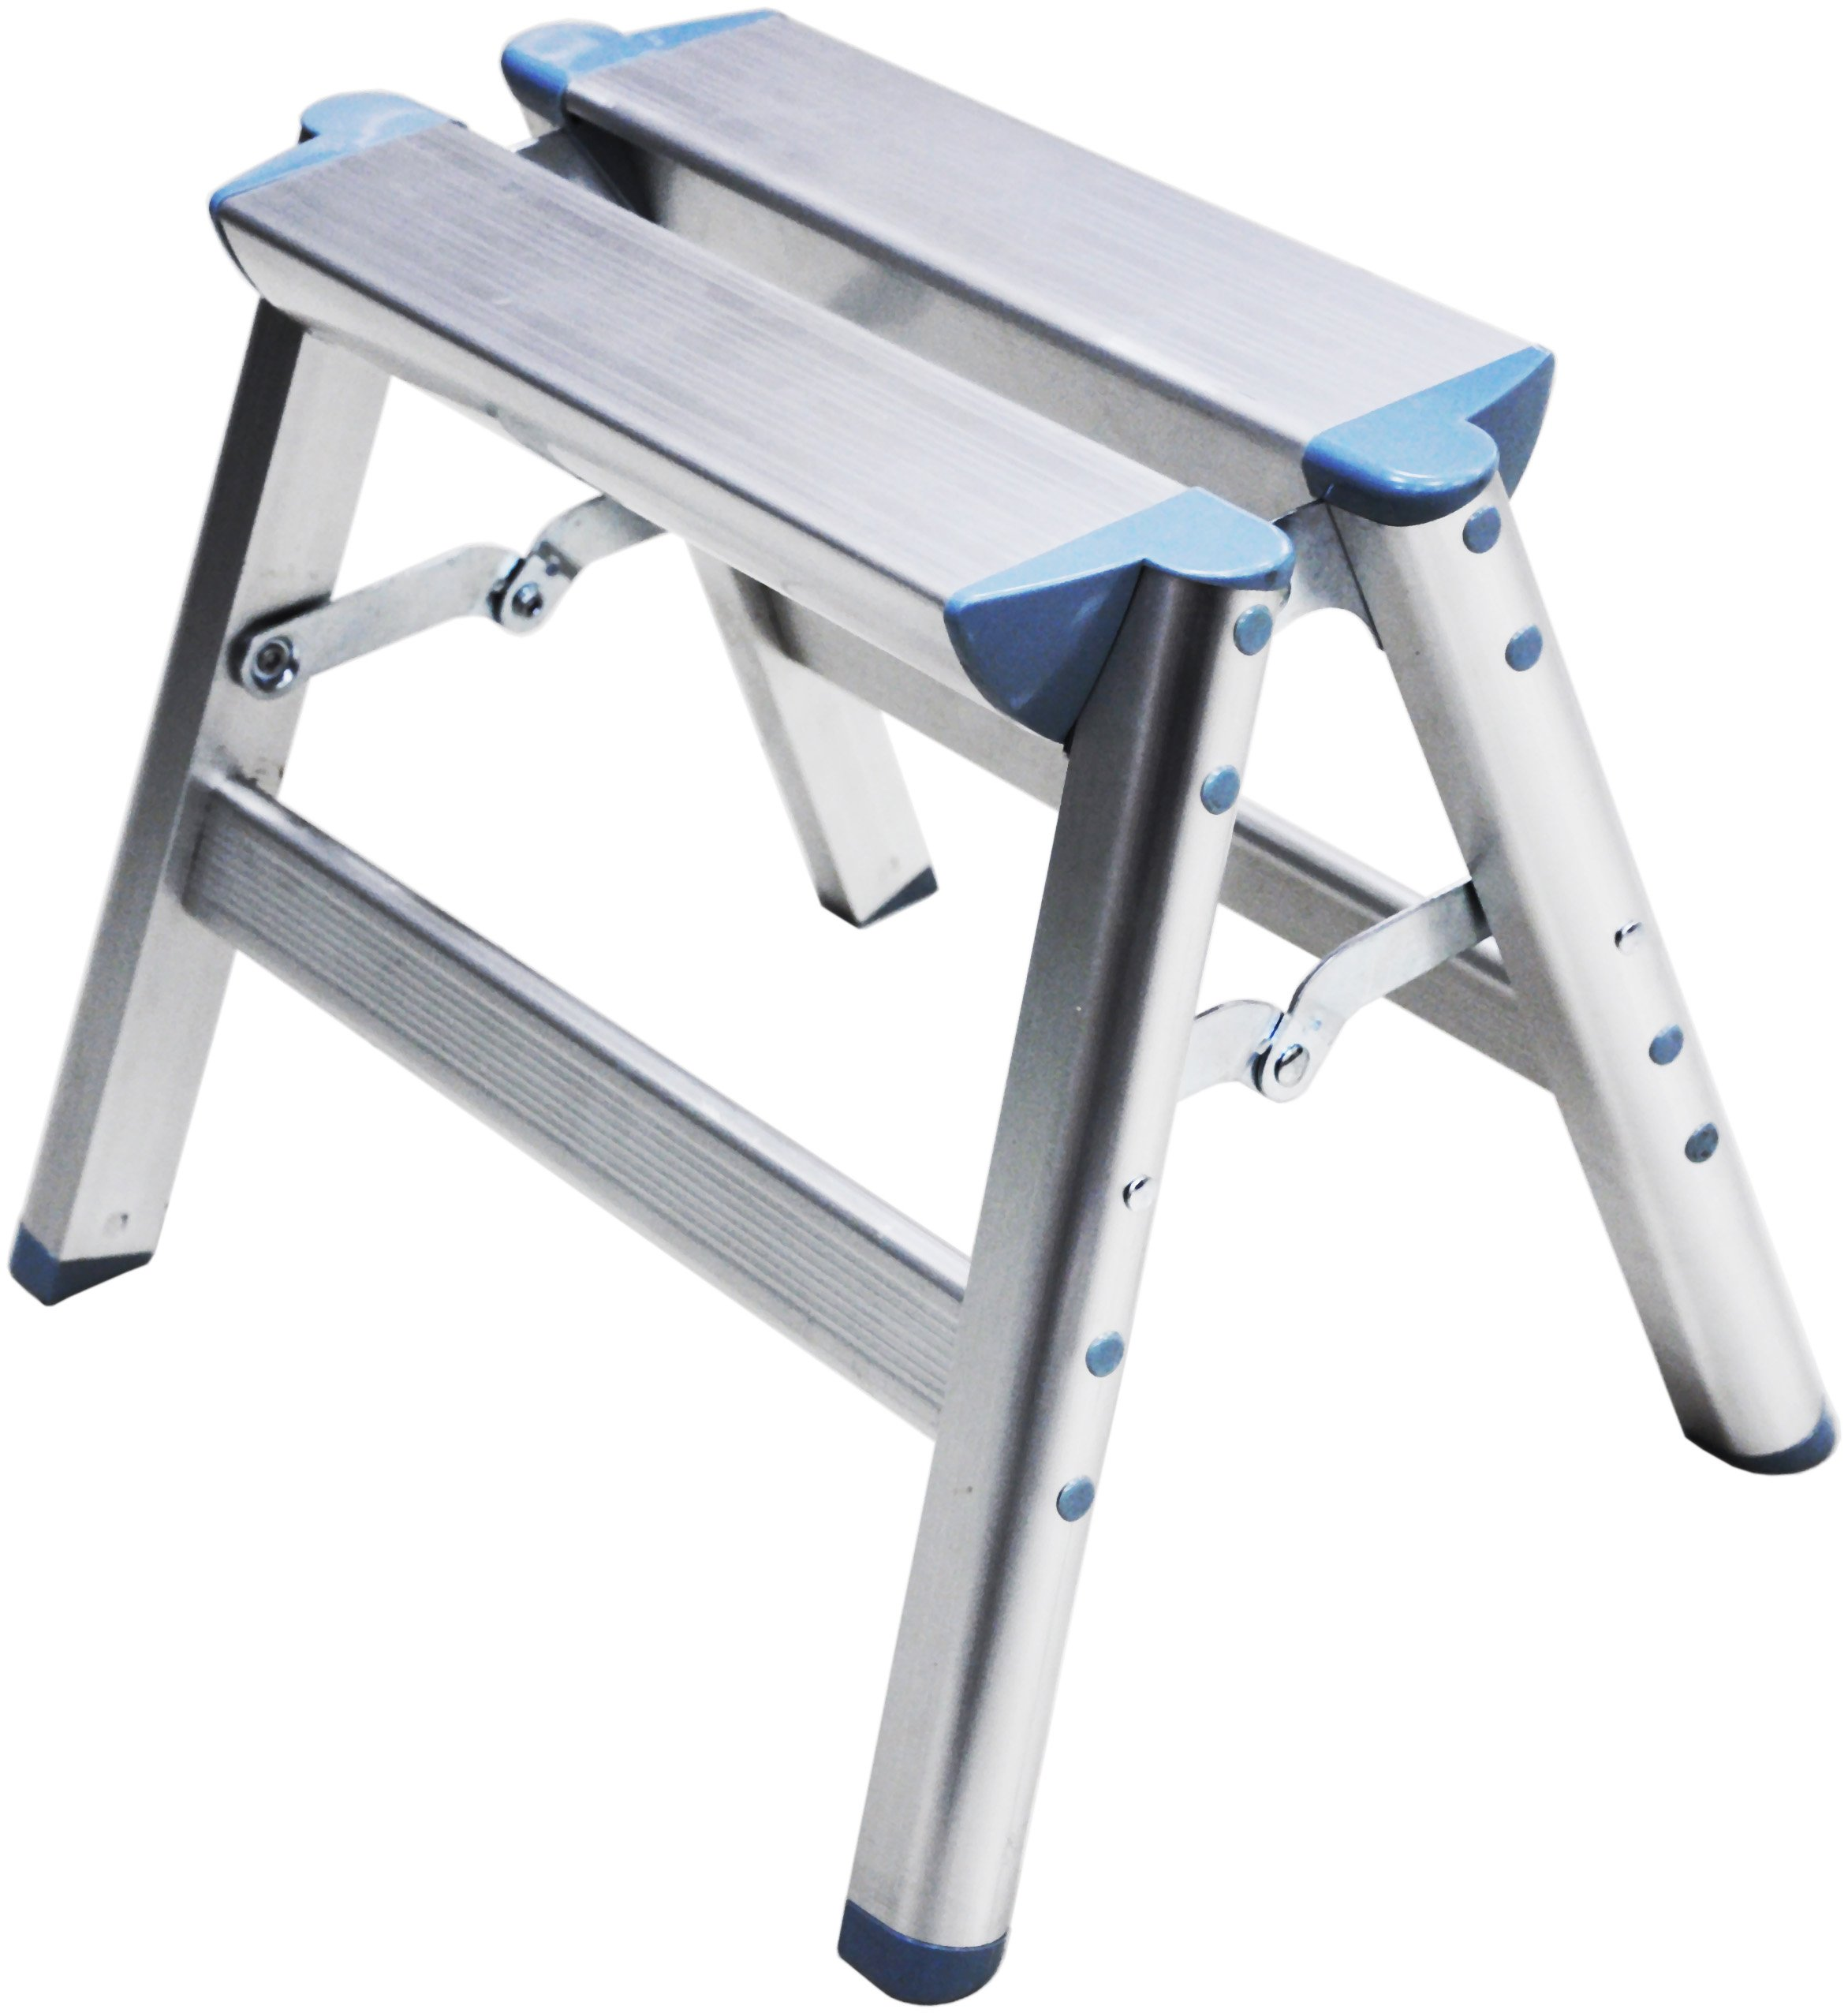 Telesteps 100SS OSHA Compliant 12 inch Aluminum Folding Step Stool by Telesteps (Image #1)